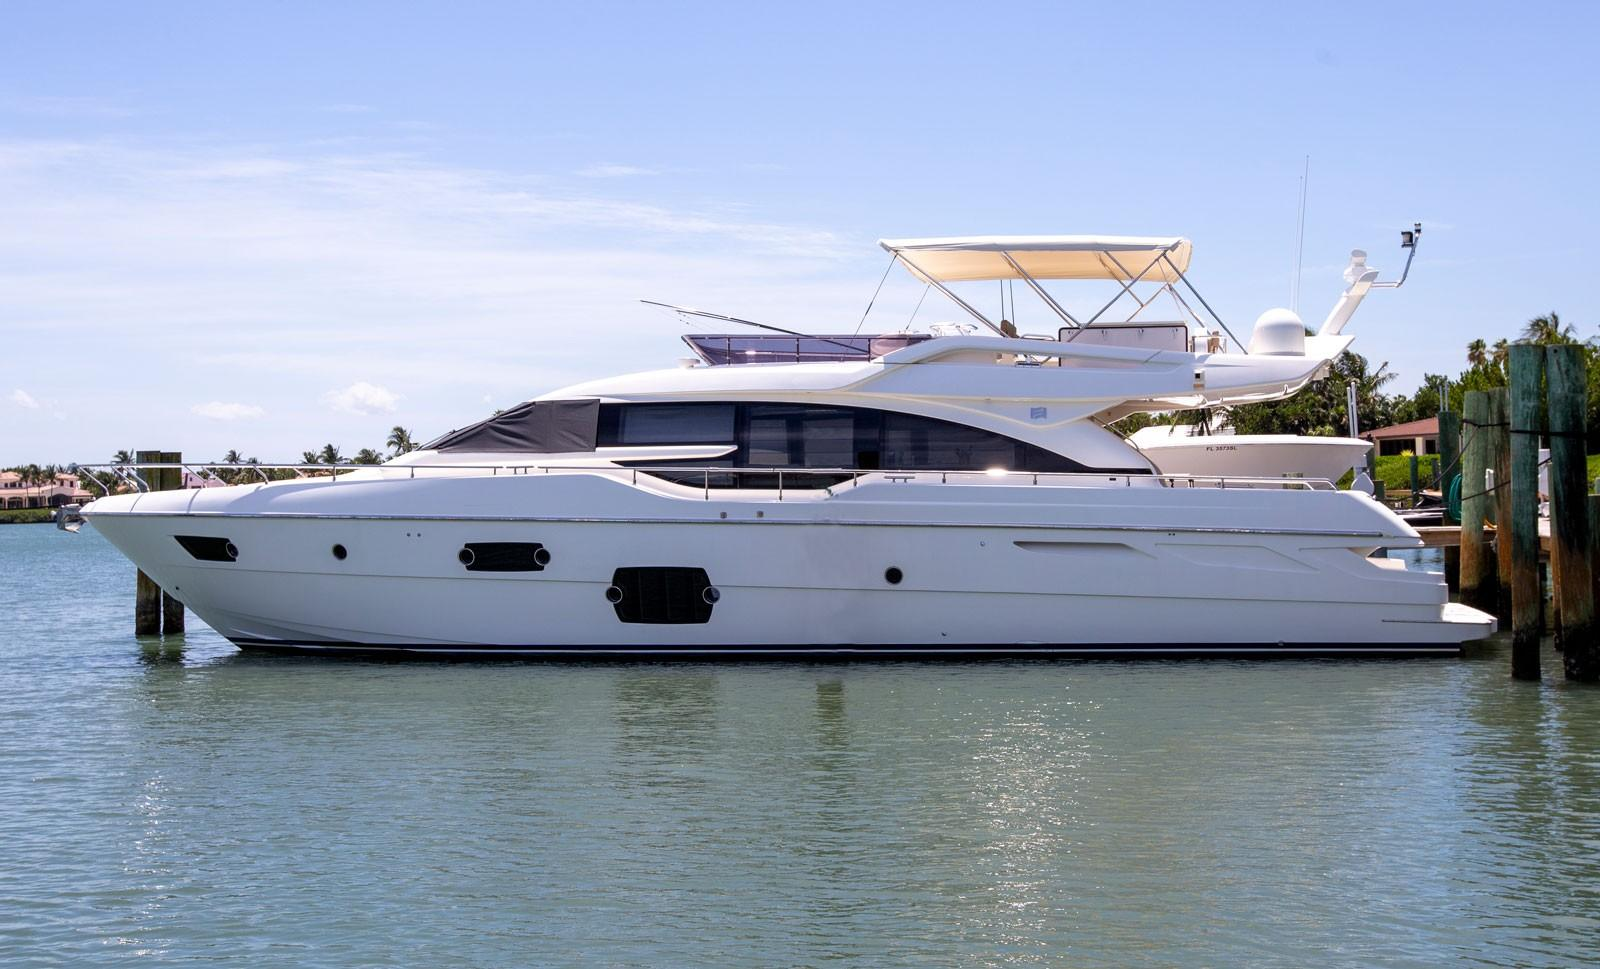 Flybridge Motoryacht - Ferretti Yacht 690